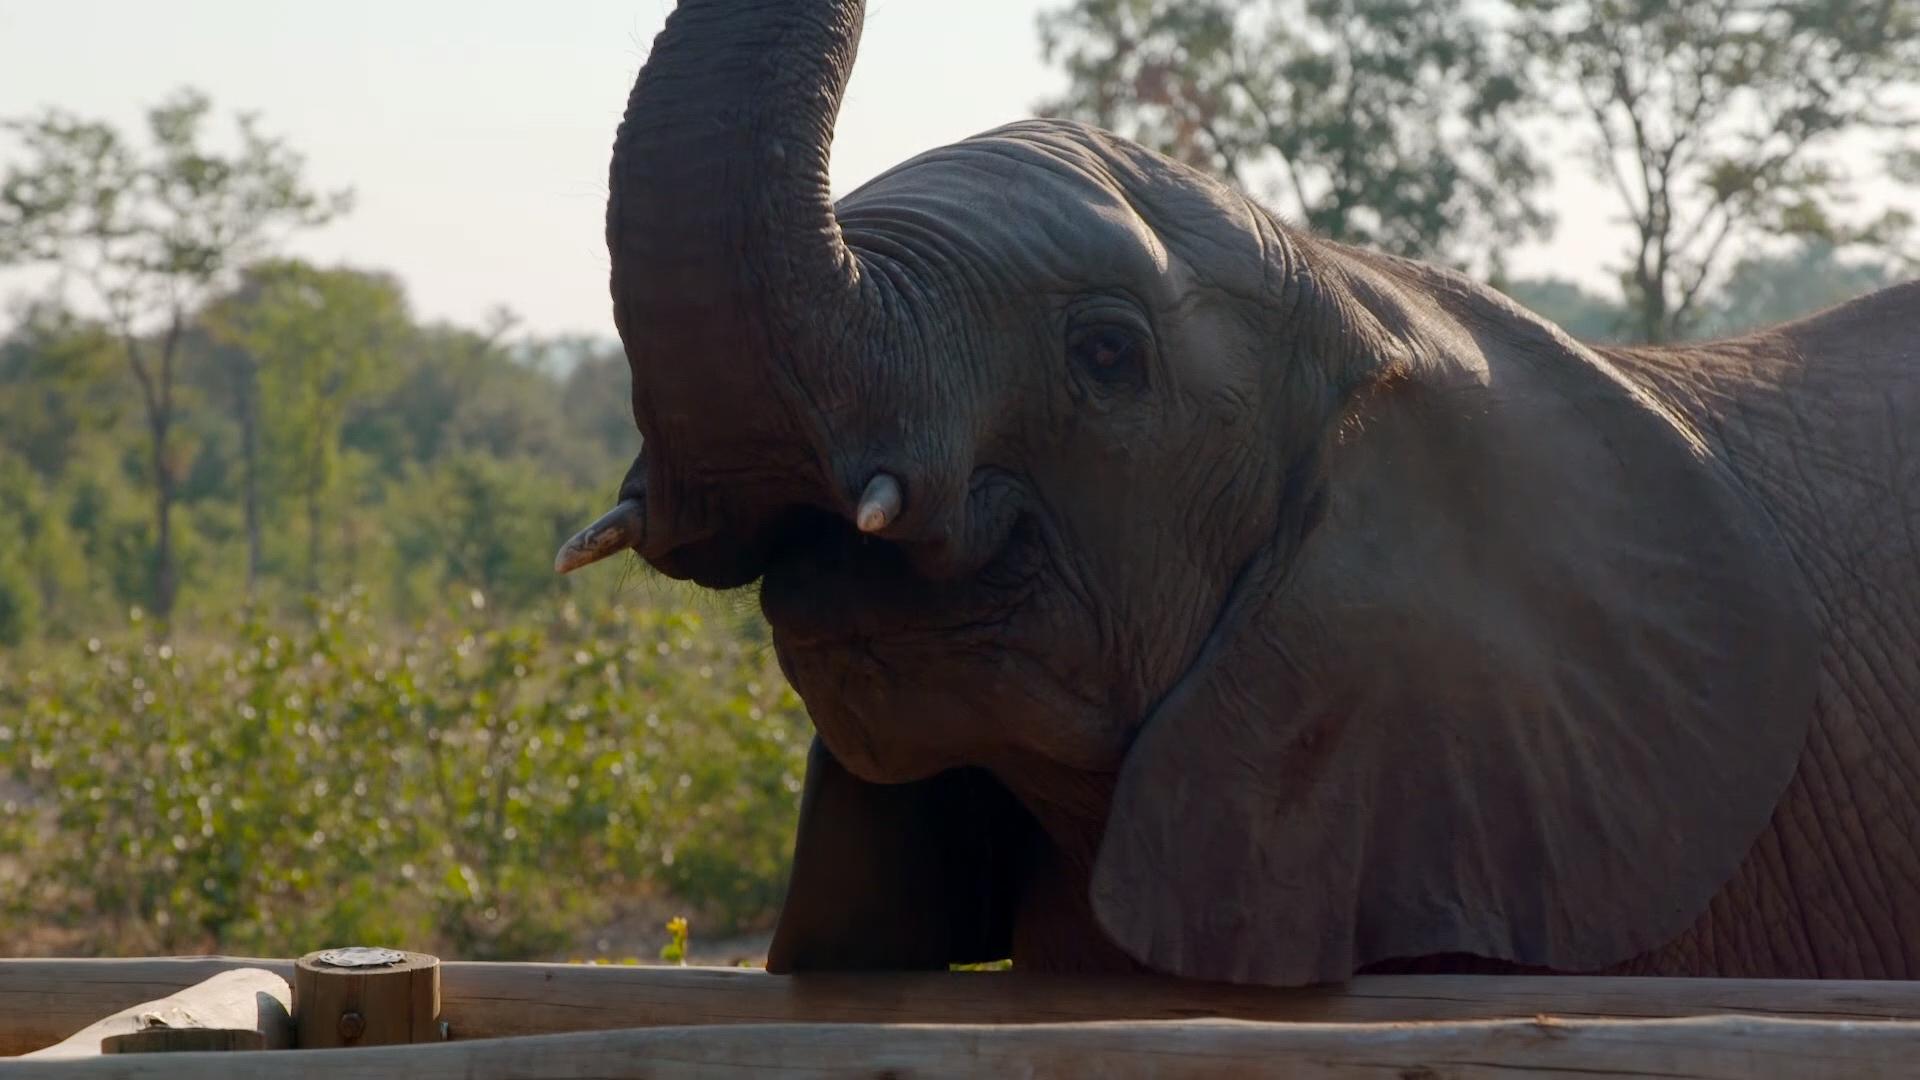 Wild Horizons Elephant Sanctuary